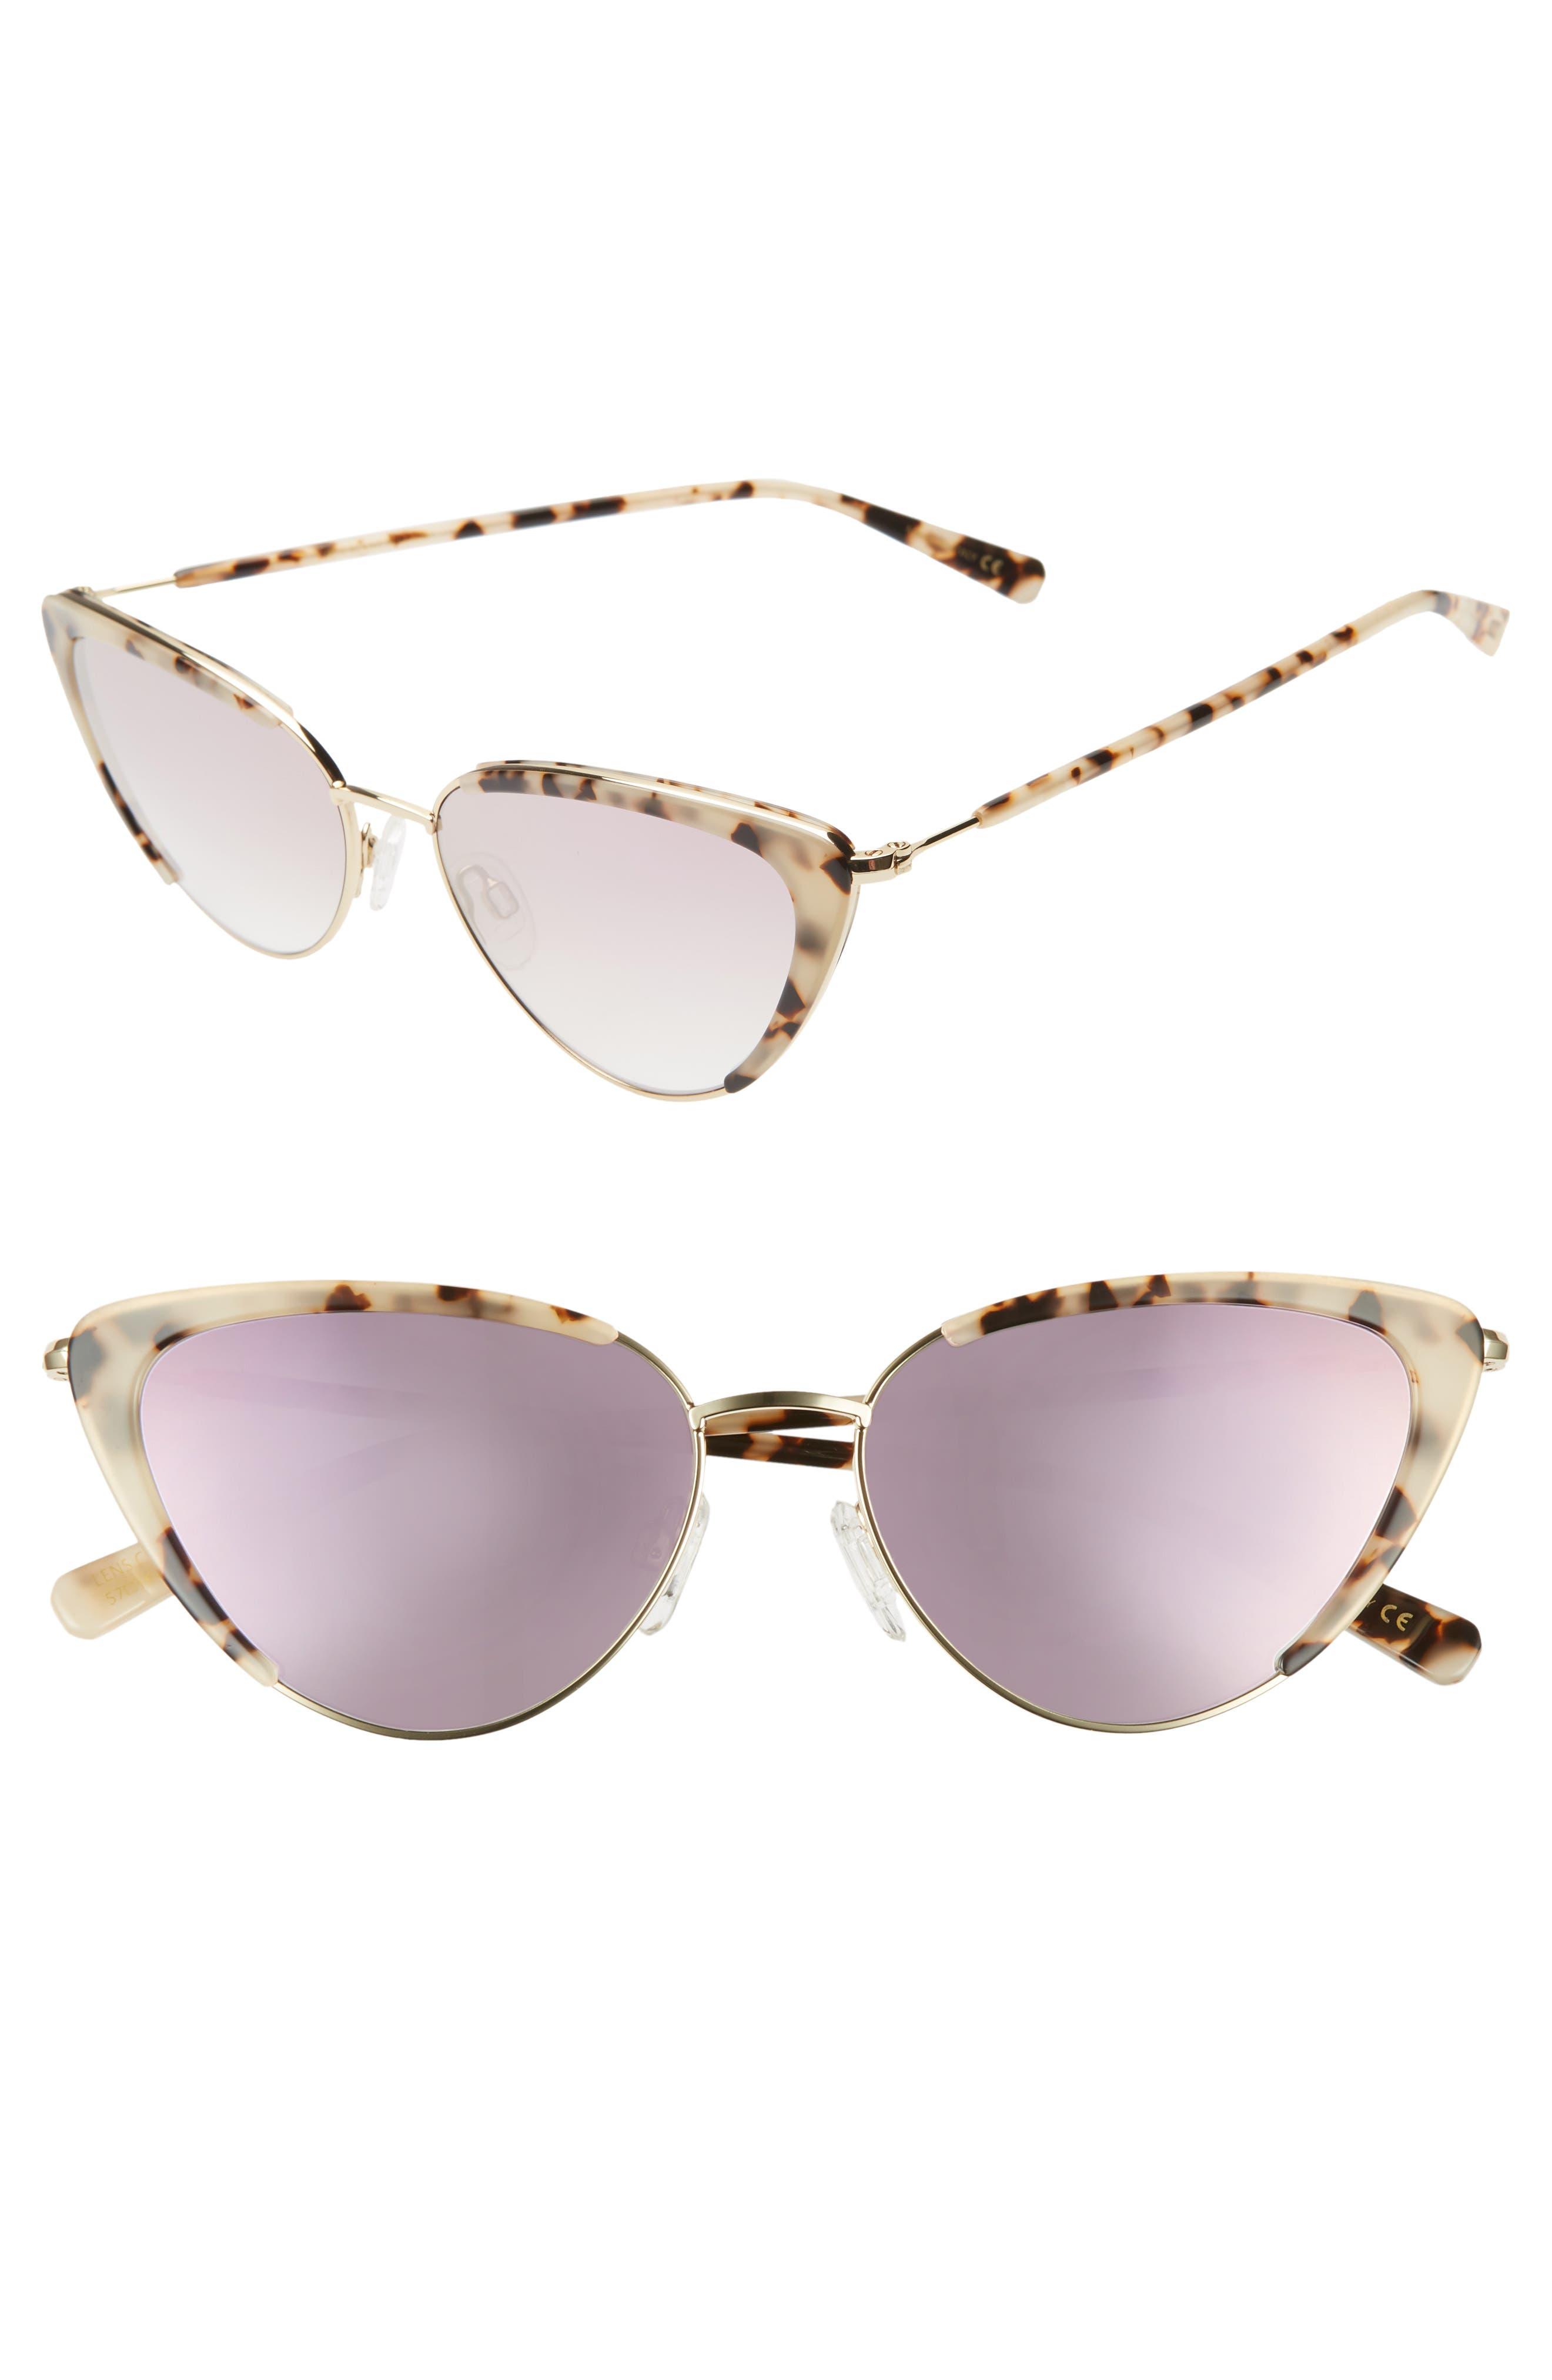 612d0e9337be 1950s Sunglasses & 50s Glasses | Retro Cat Eye Sunglasses Womens DBlanc X  Amuse Society La